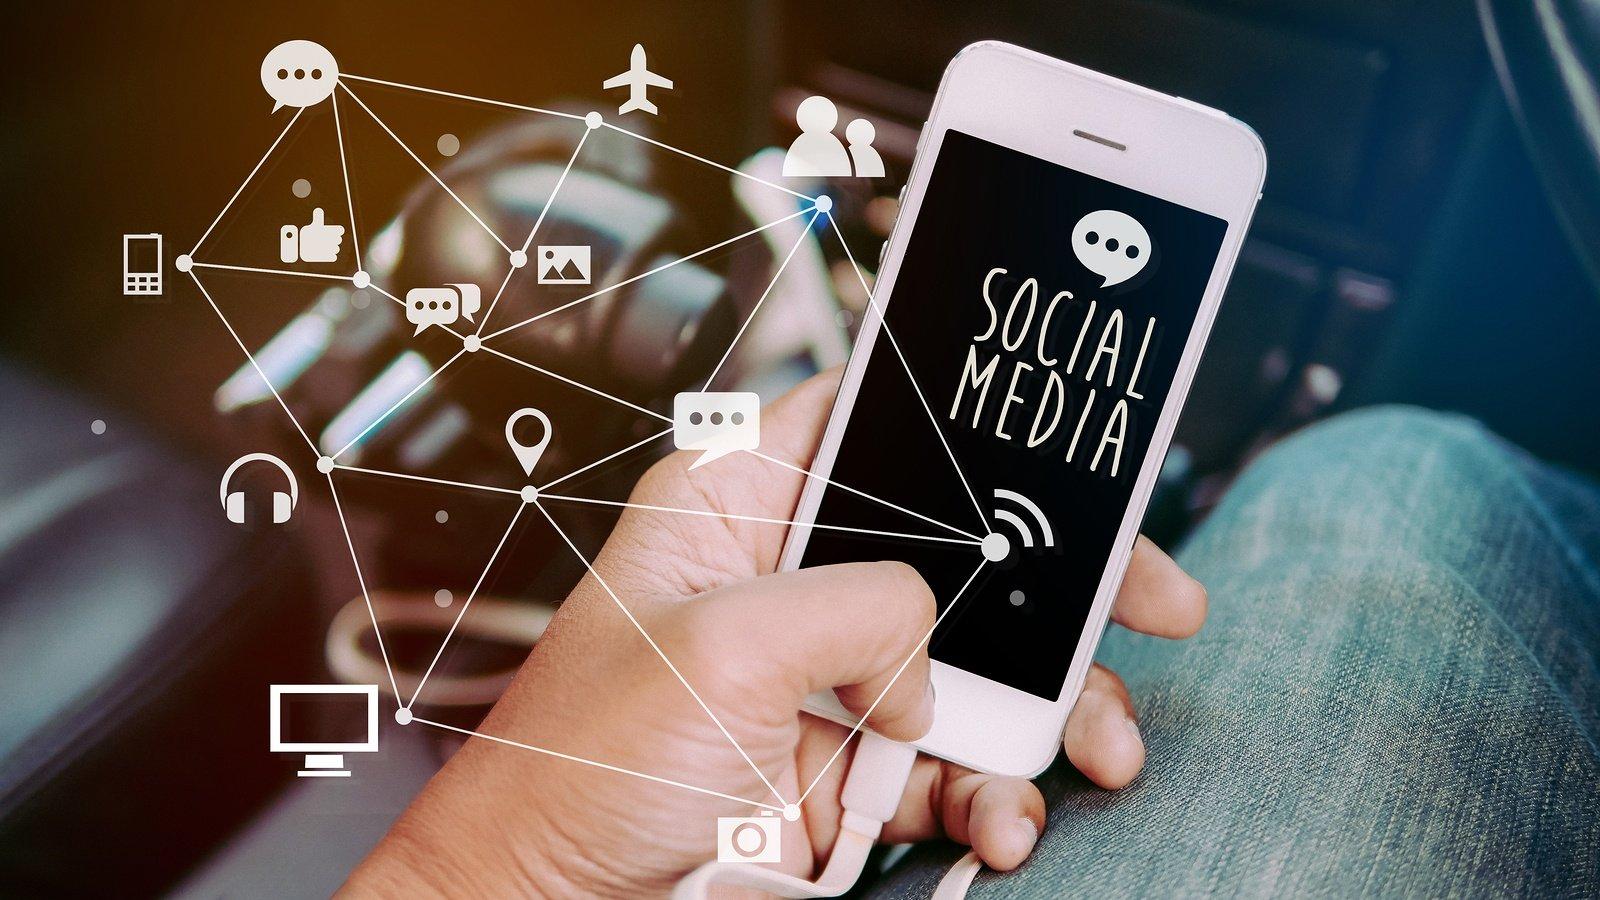 Social Media Marketing Agency in Dubai